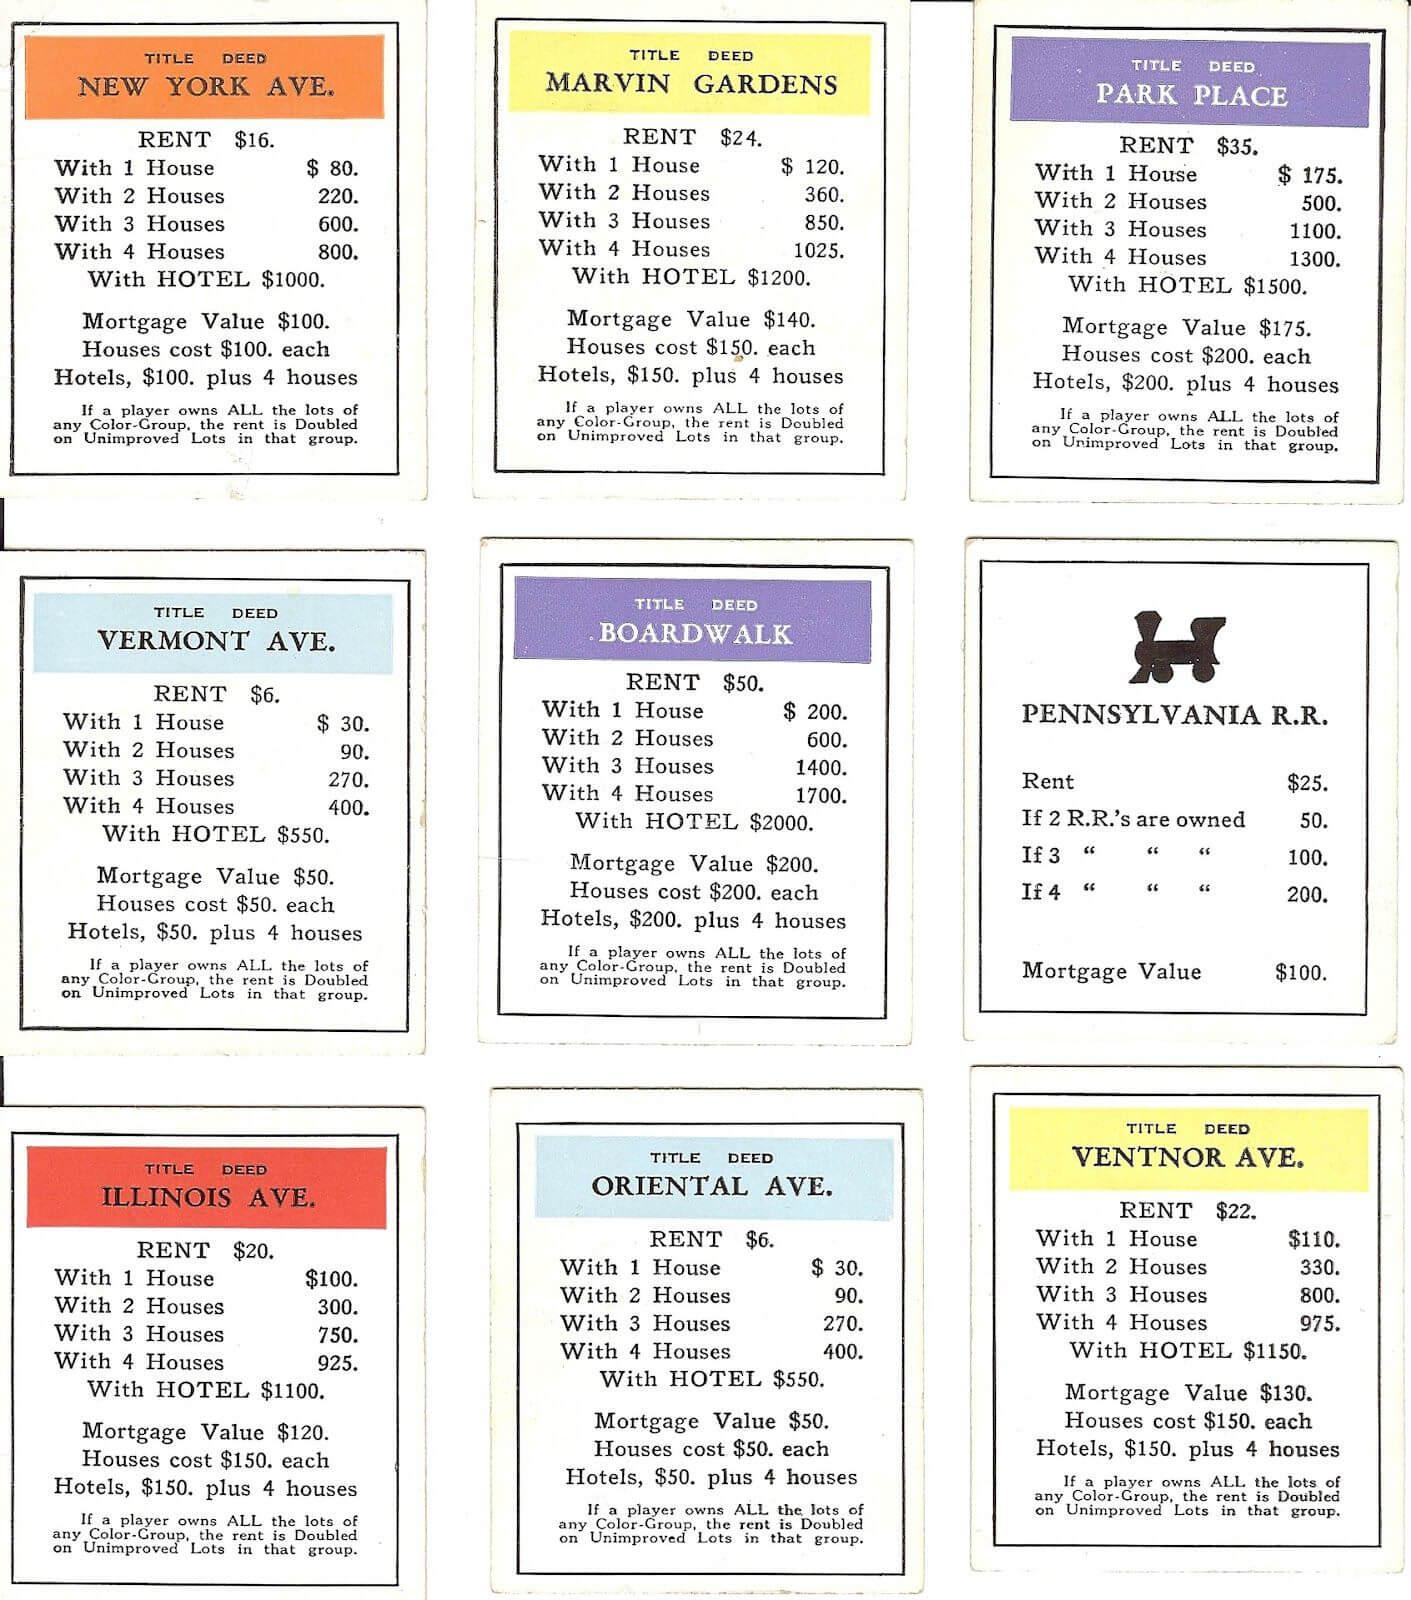 Free Vintage Digital Stamps**: Free Vintage Ephemera With Monopoly Property Card Template